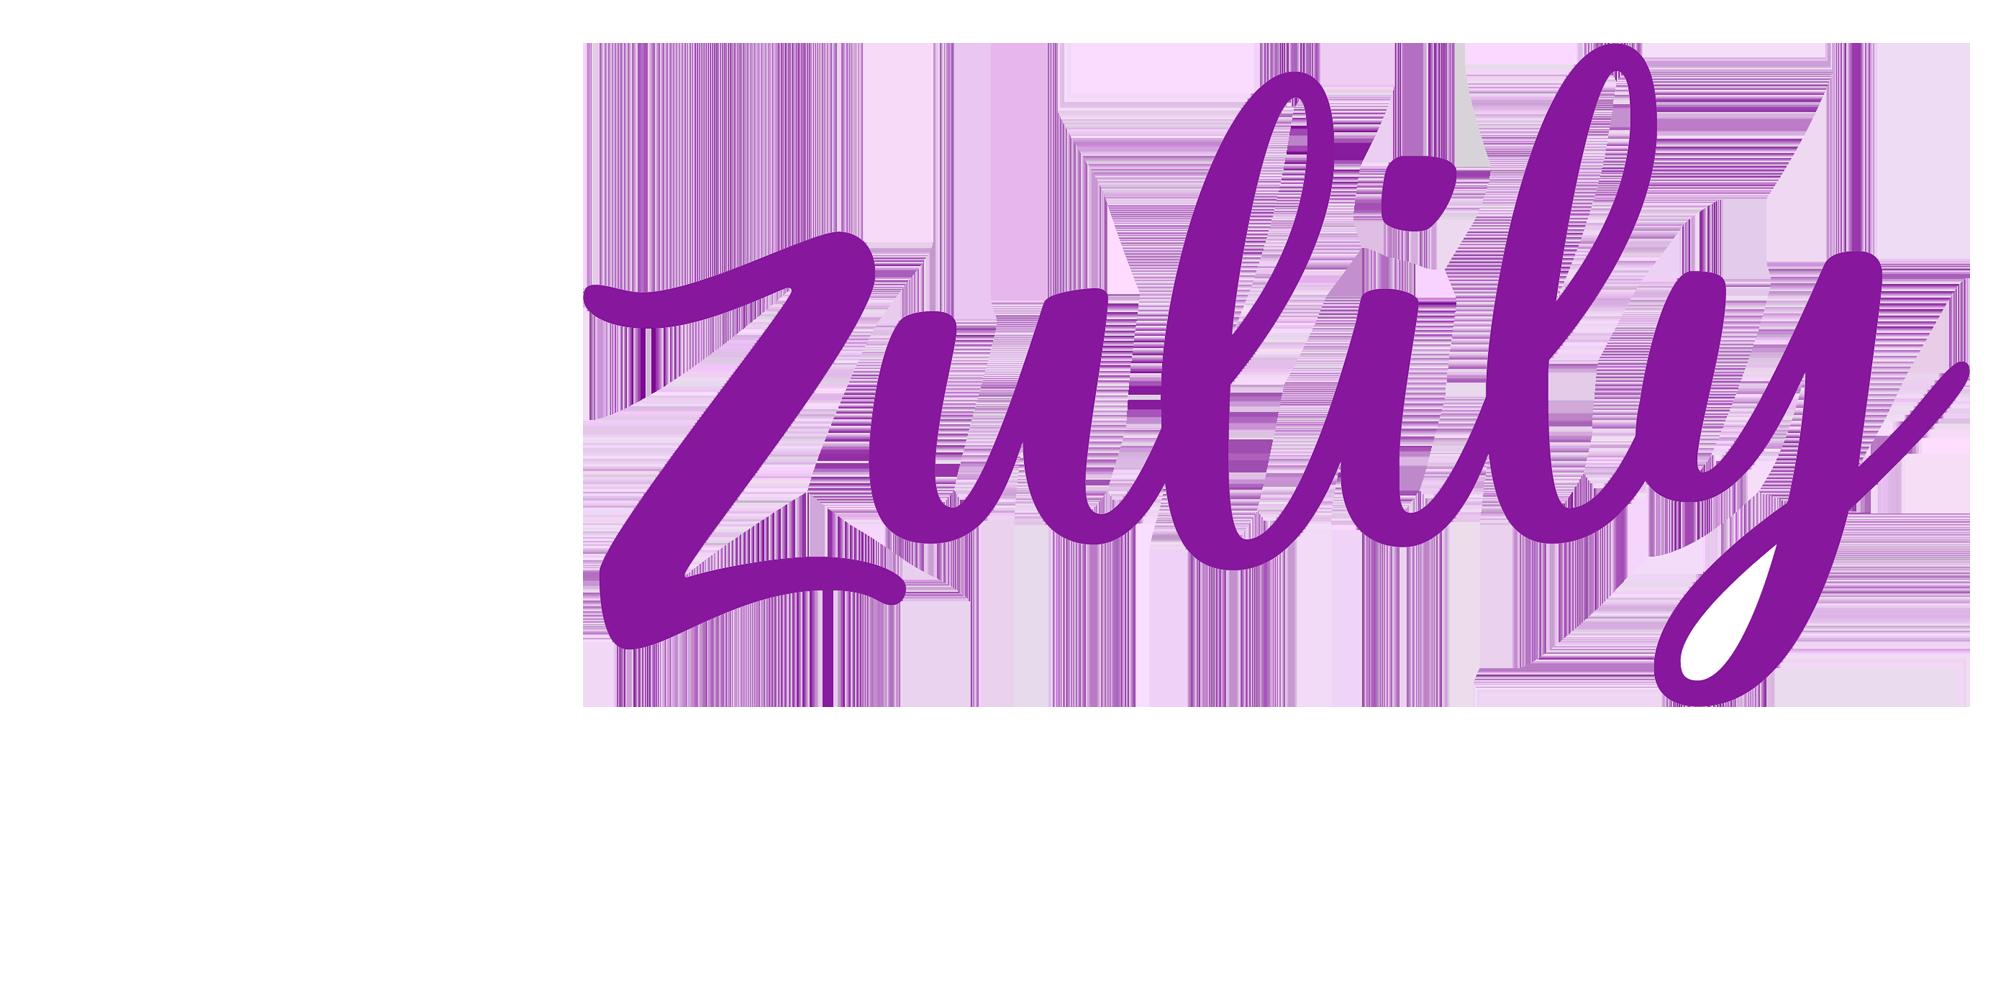 Zulily_Joy Of Shopping_September_2020